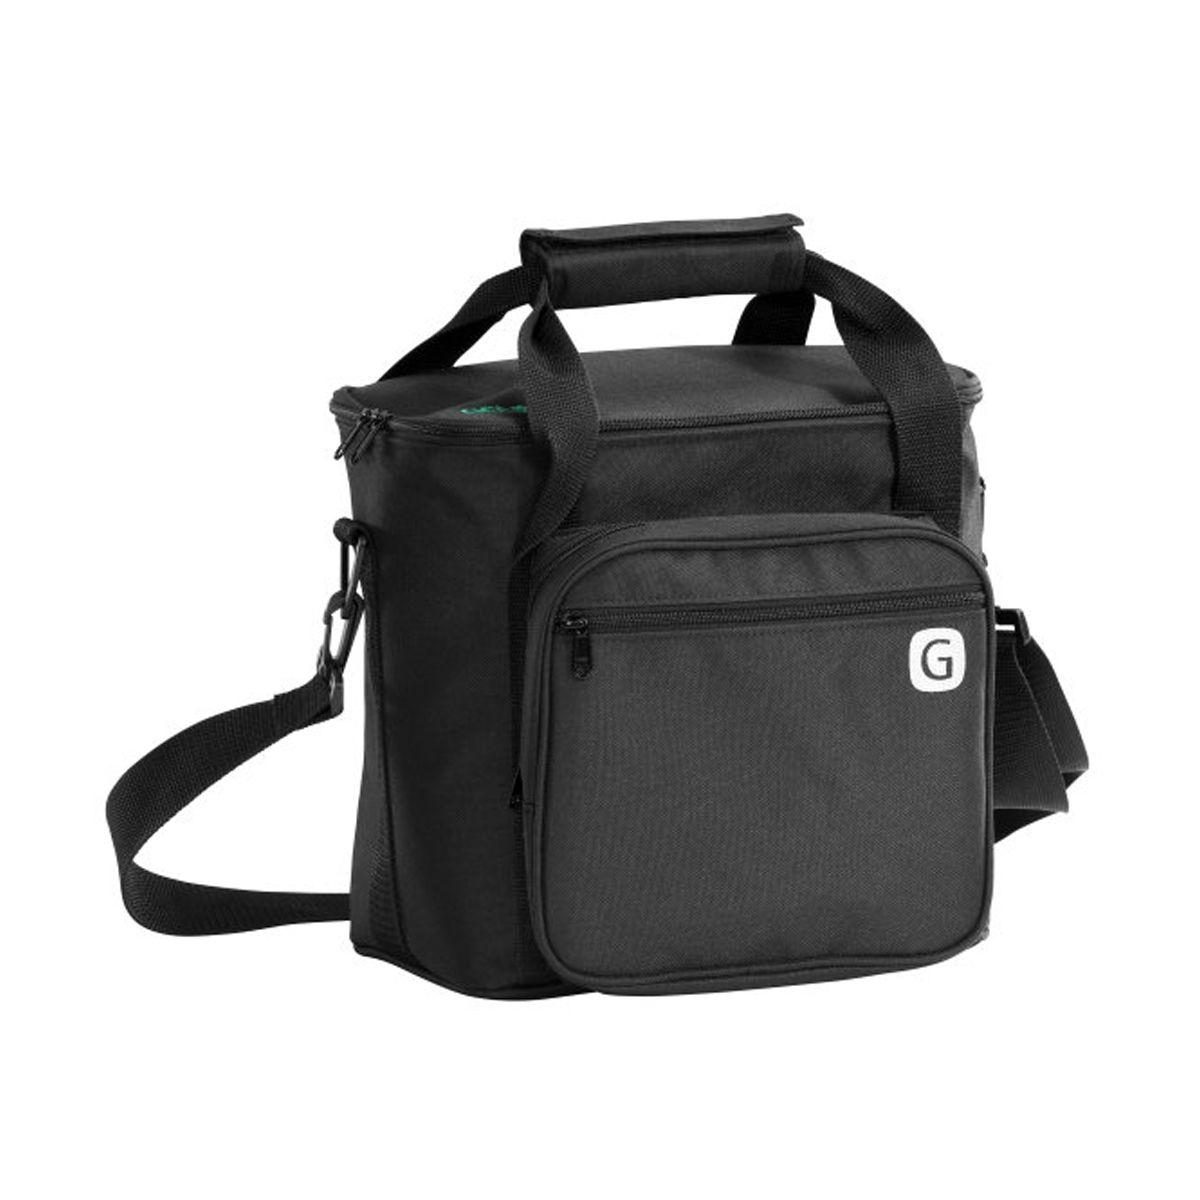 Genelec 8020-423 Carry Bag for 2 x 8020 Monitors